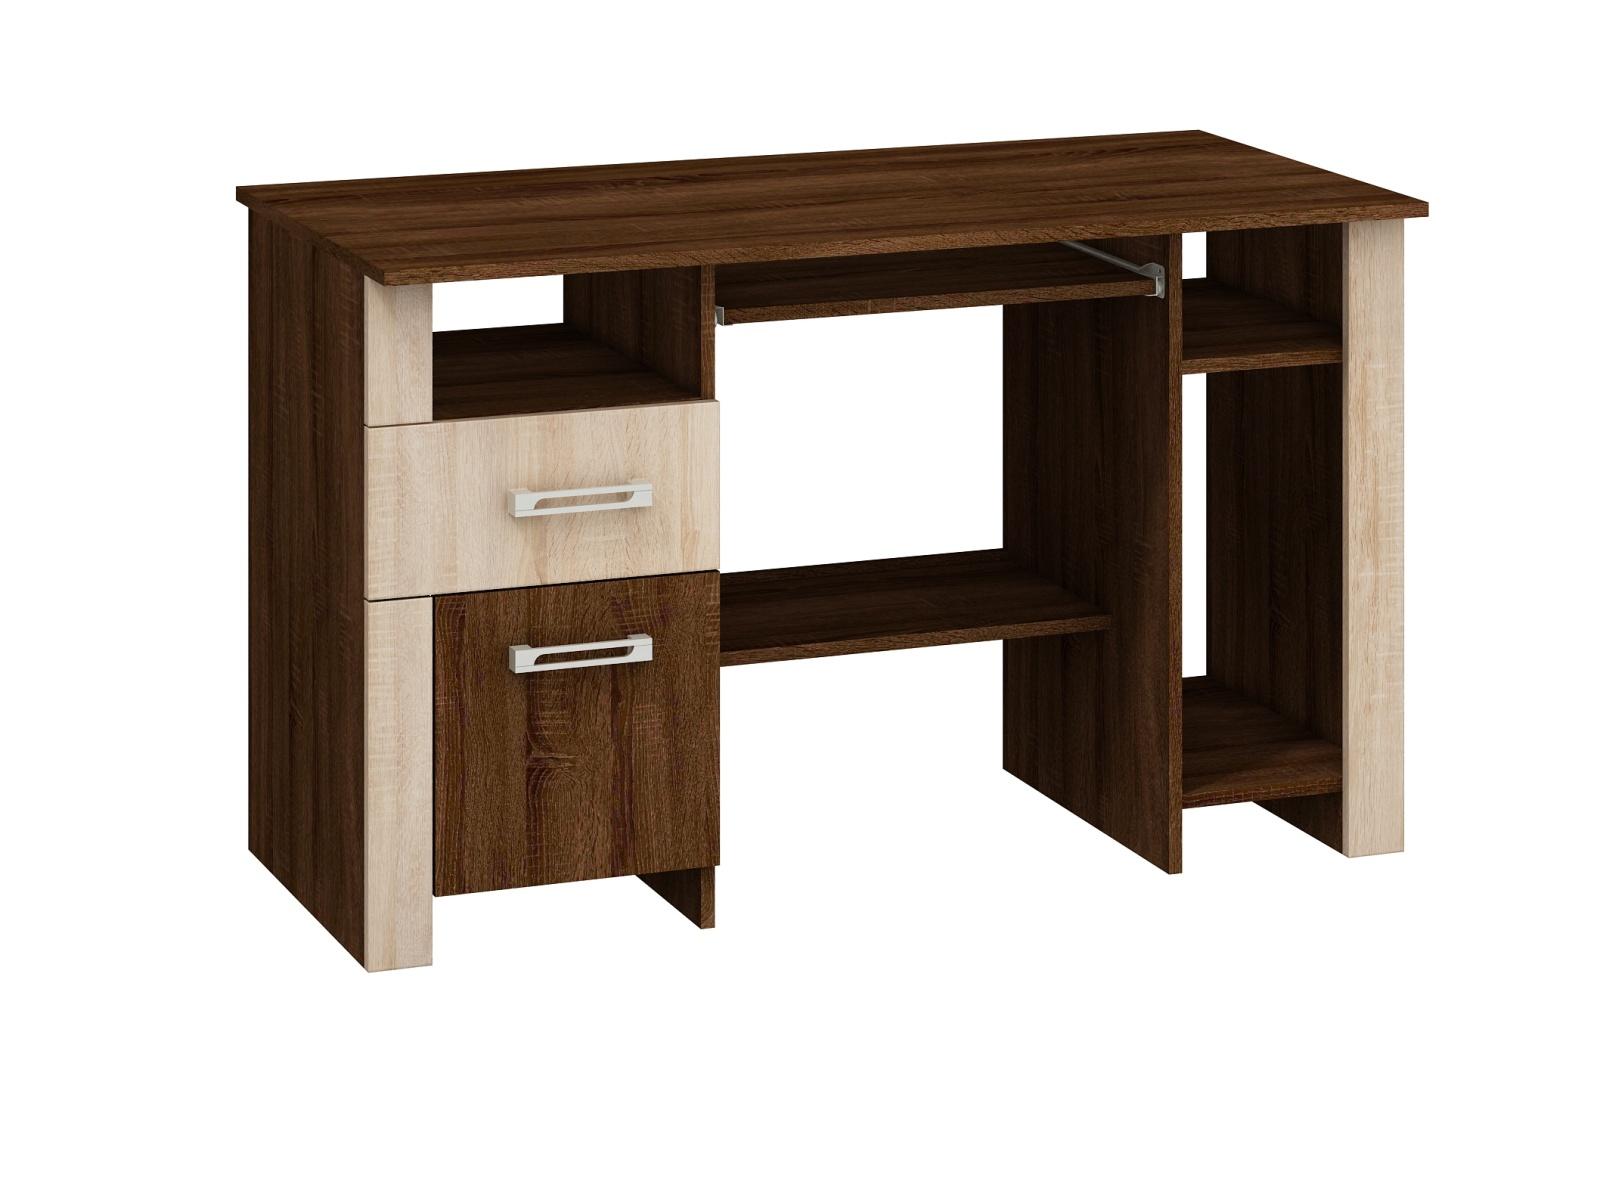 MORAVIA FLAT Studentský PC stůl HUGO mat, dub sonoma tmavý/dub sonoma